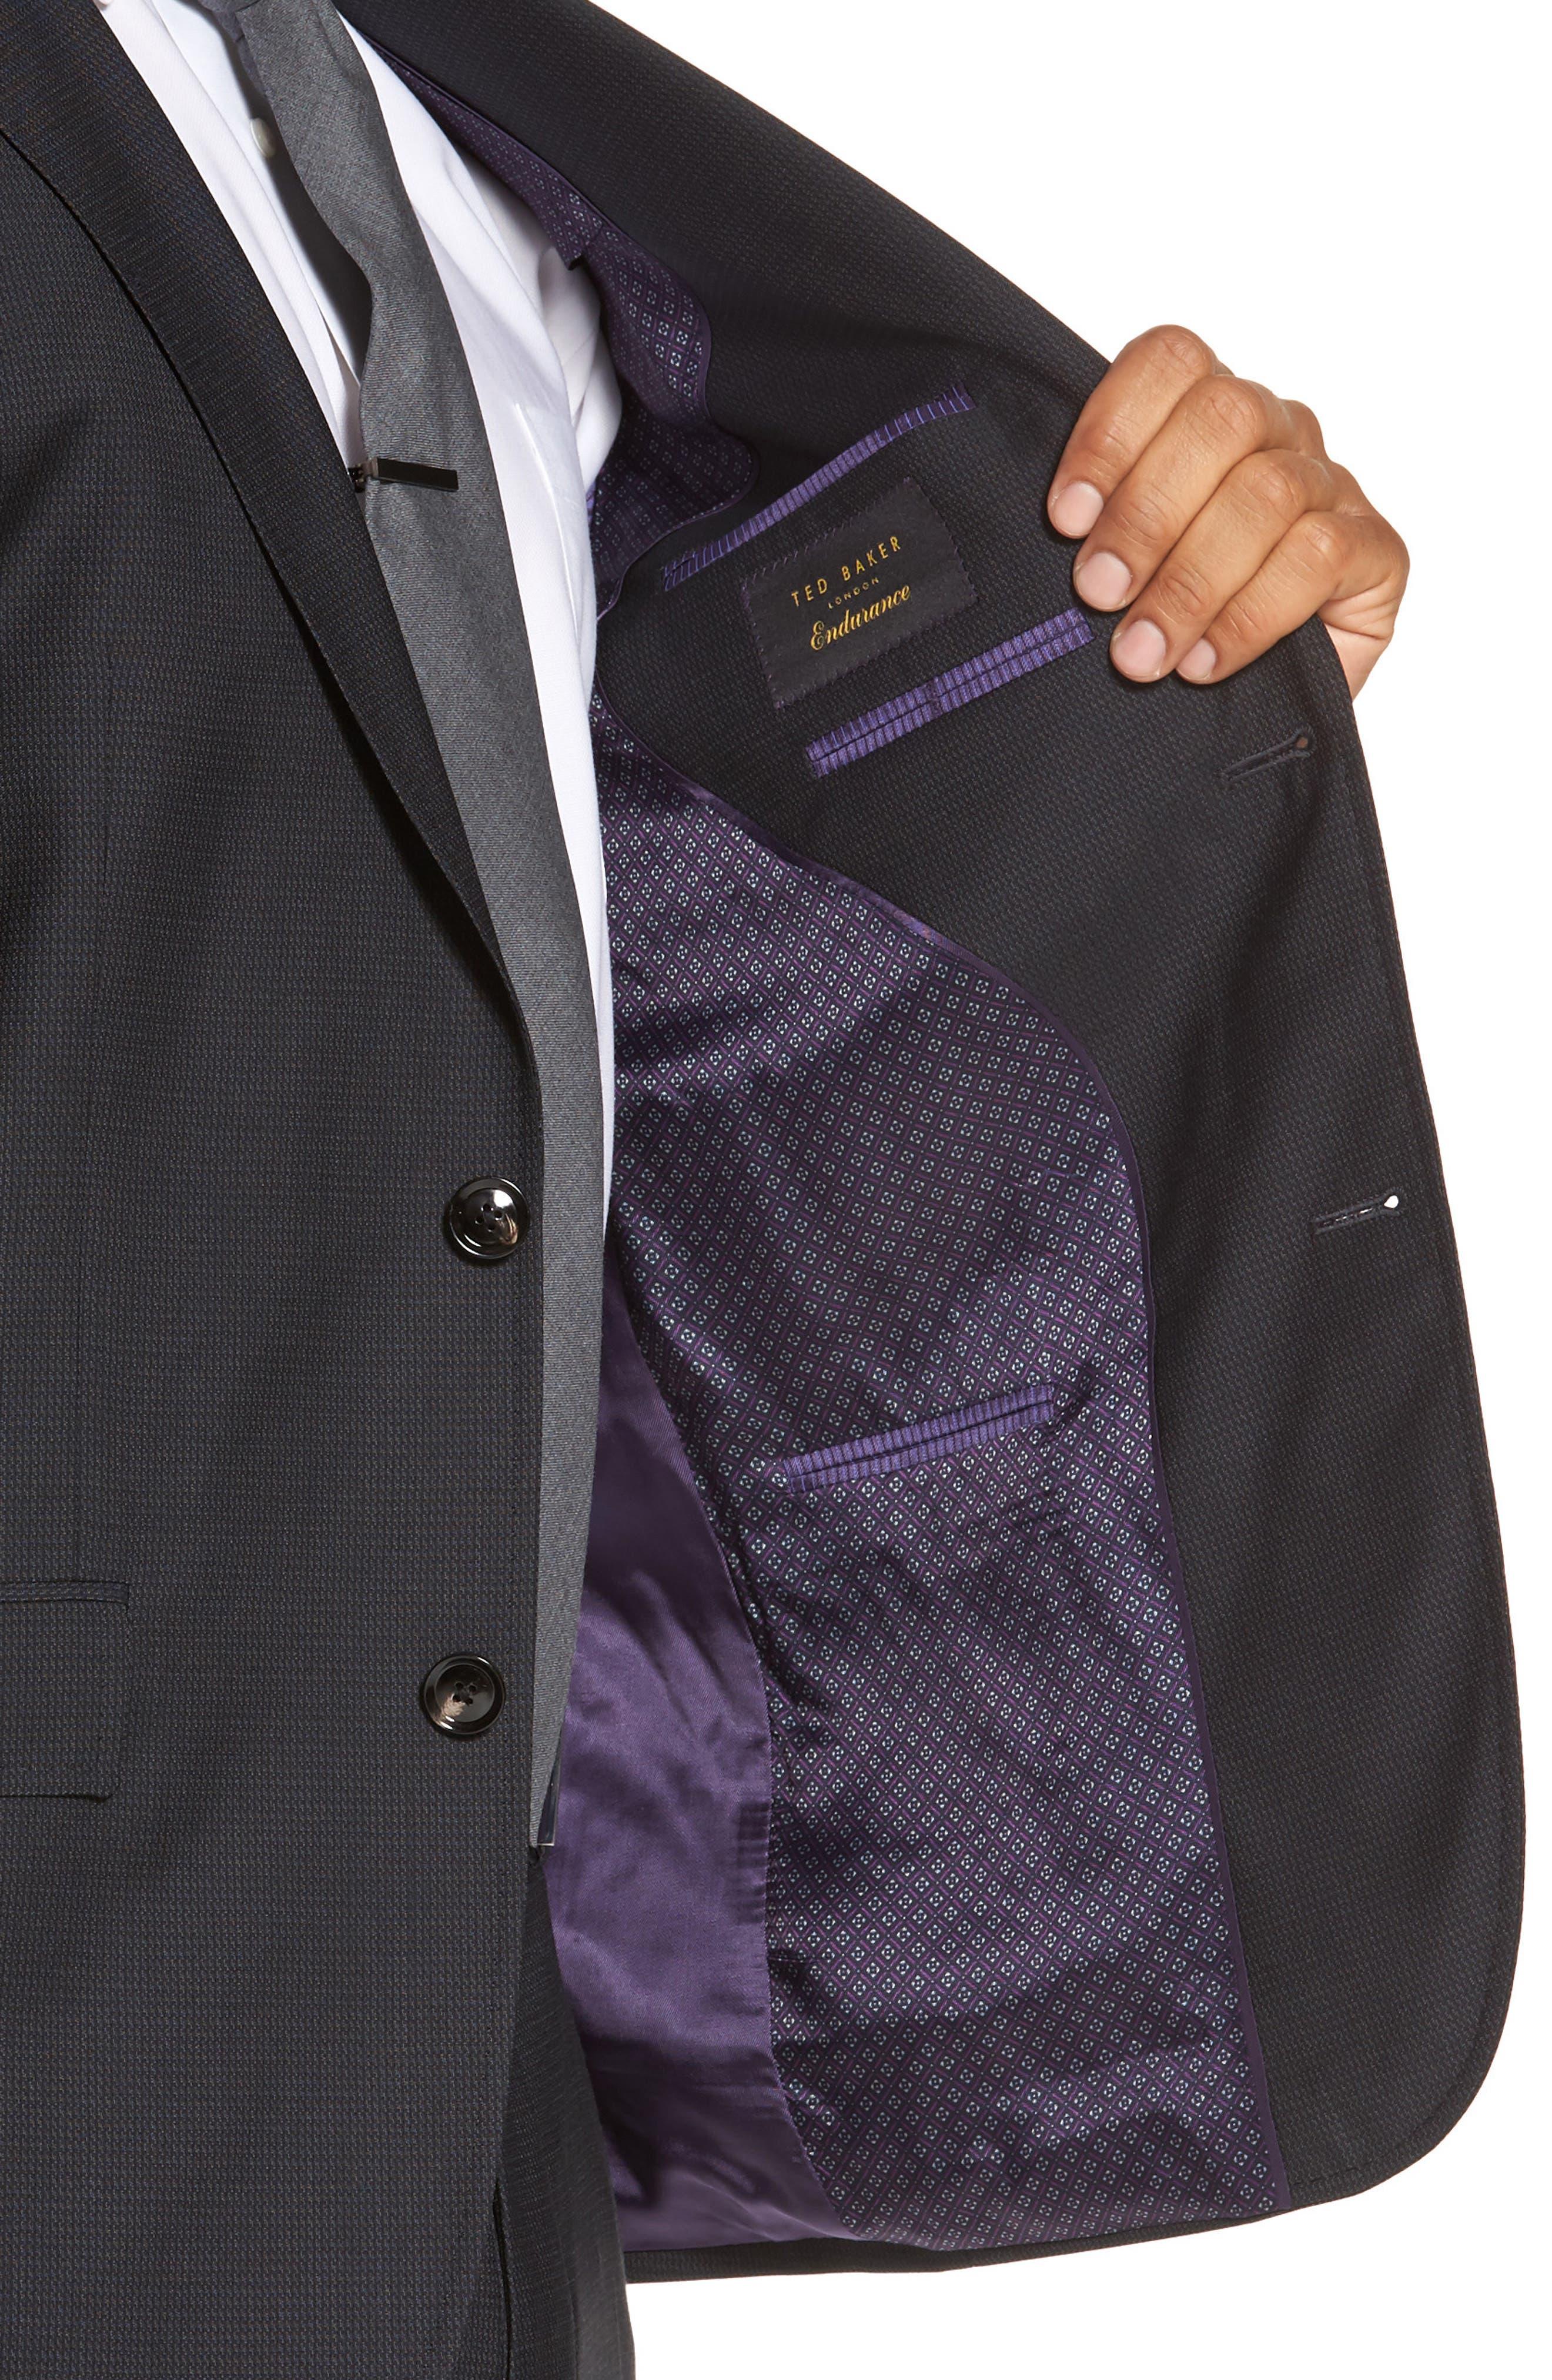 Roger Trim Fit Solid Wool Suit,                             Alternate thumbnail 4, color,                             001